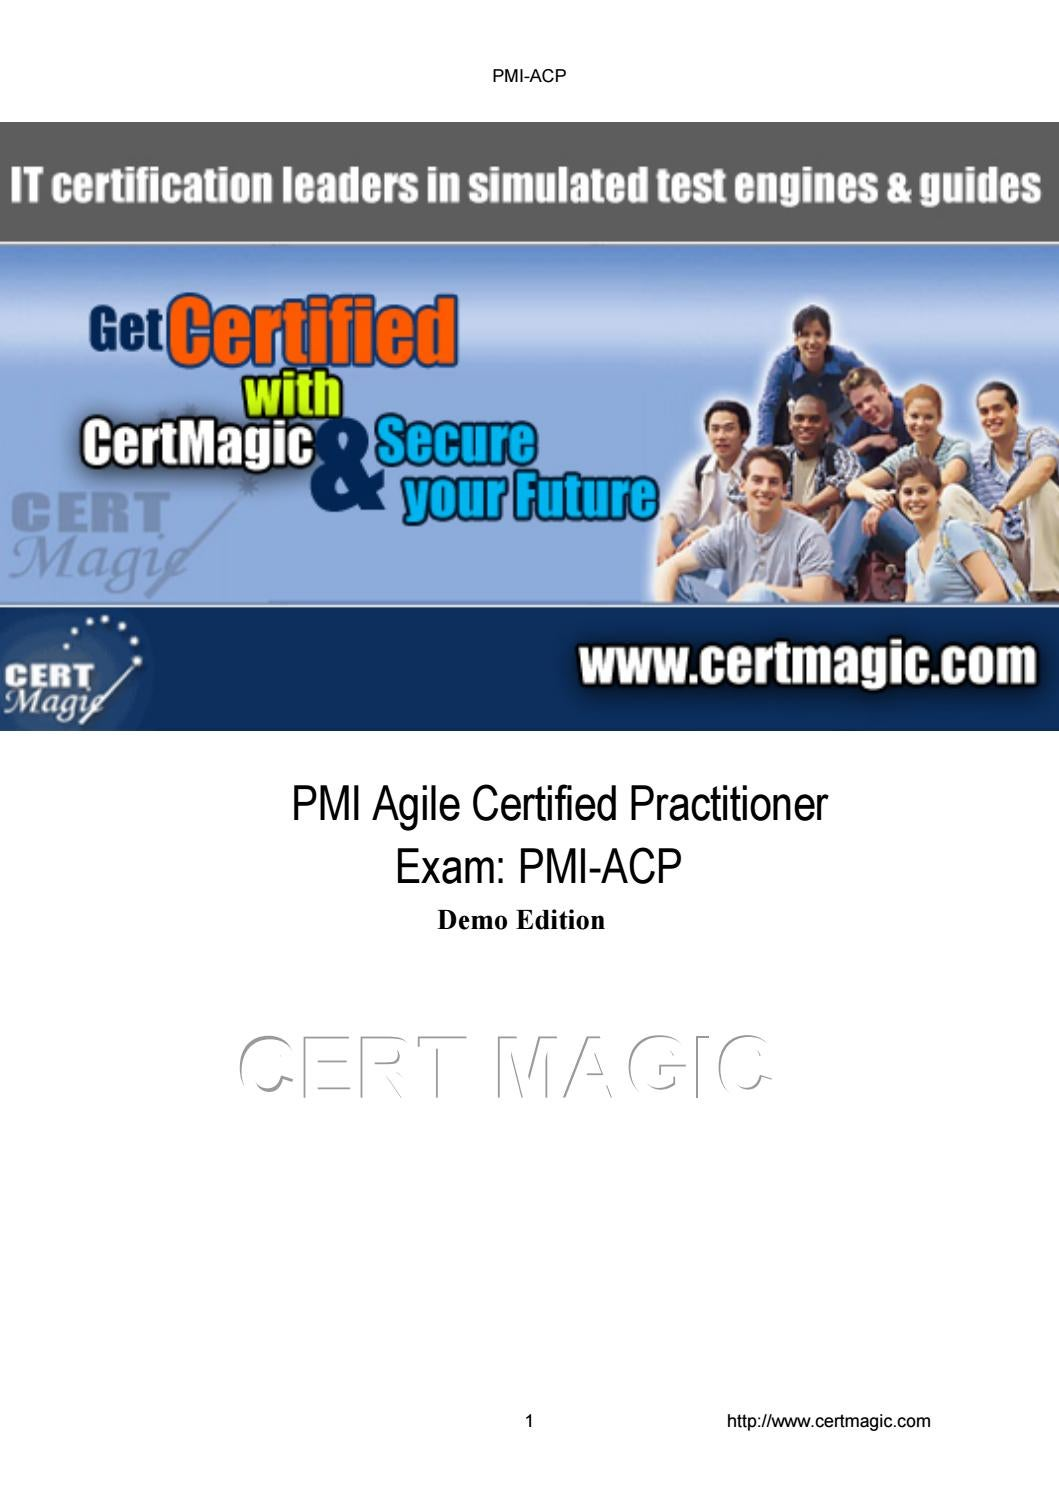 Exam pmi acp pmi agile certified practitioner exam by olivia exam pmi acp pmi agile certified practitioner exam by olivia jayden issuu 1betcityfo Images